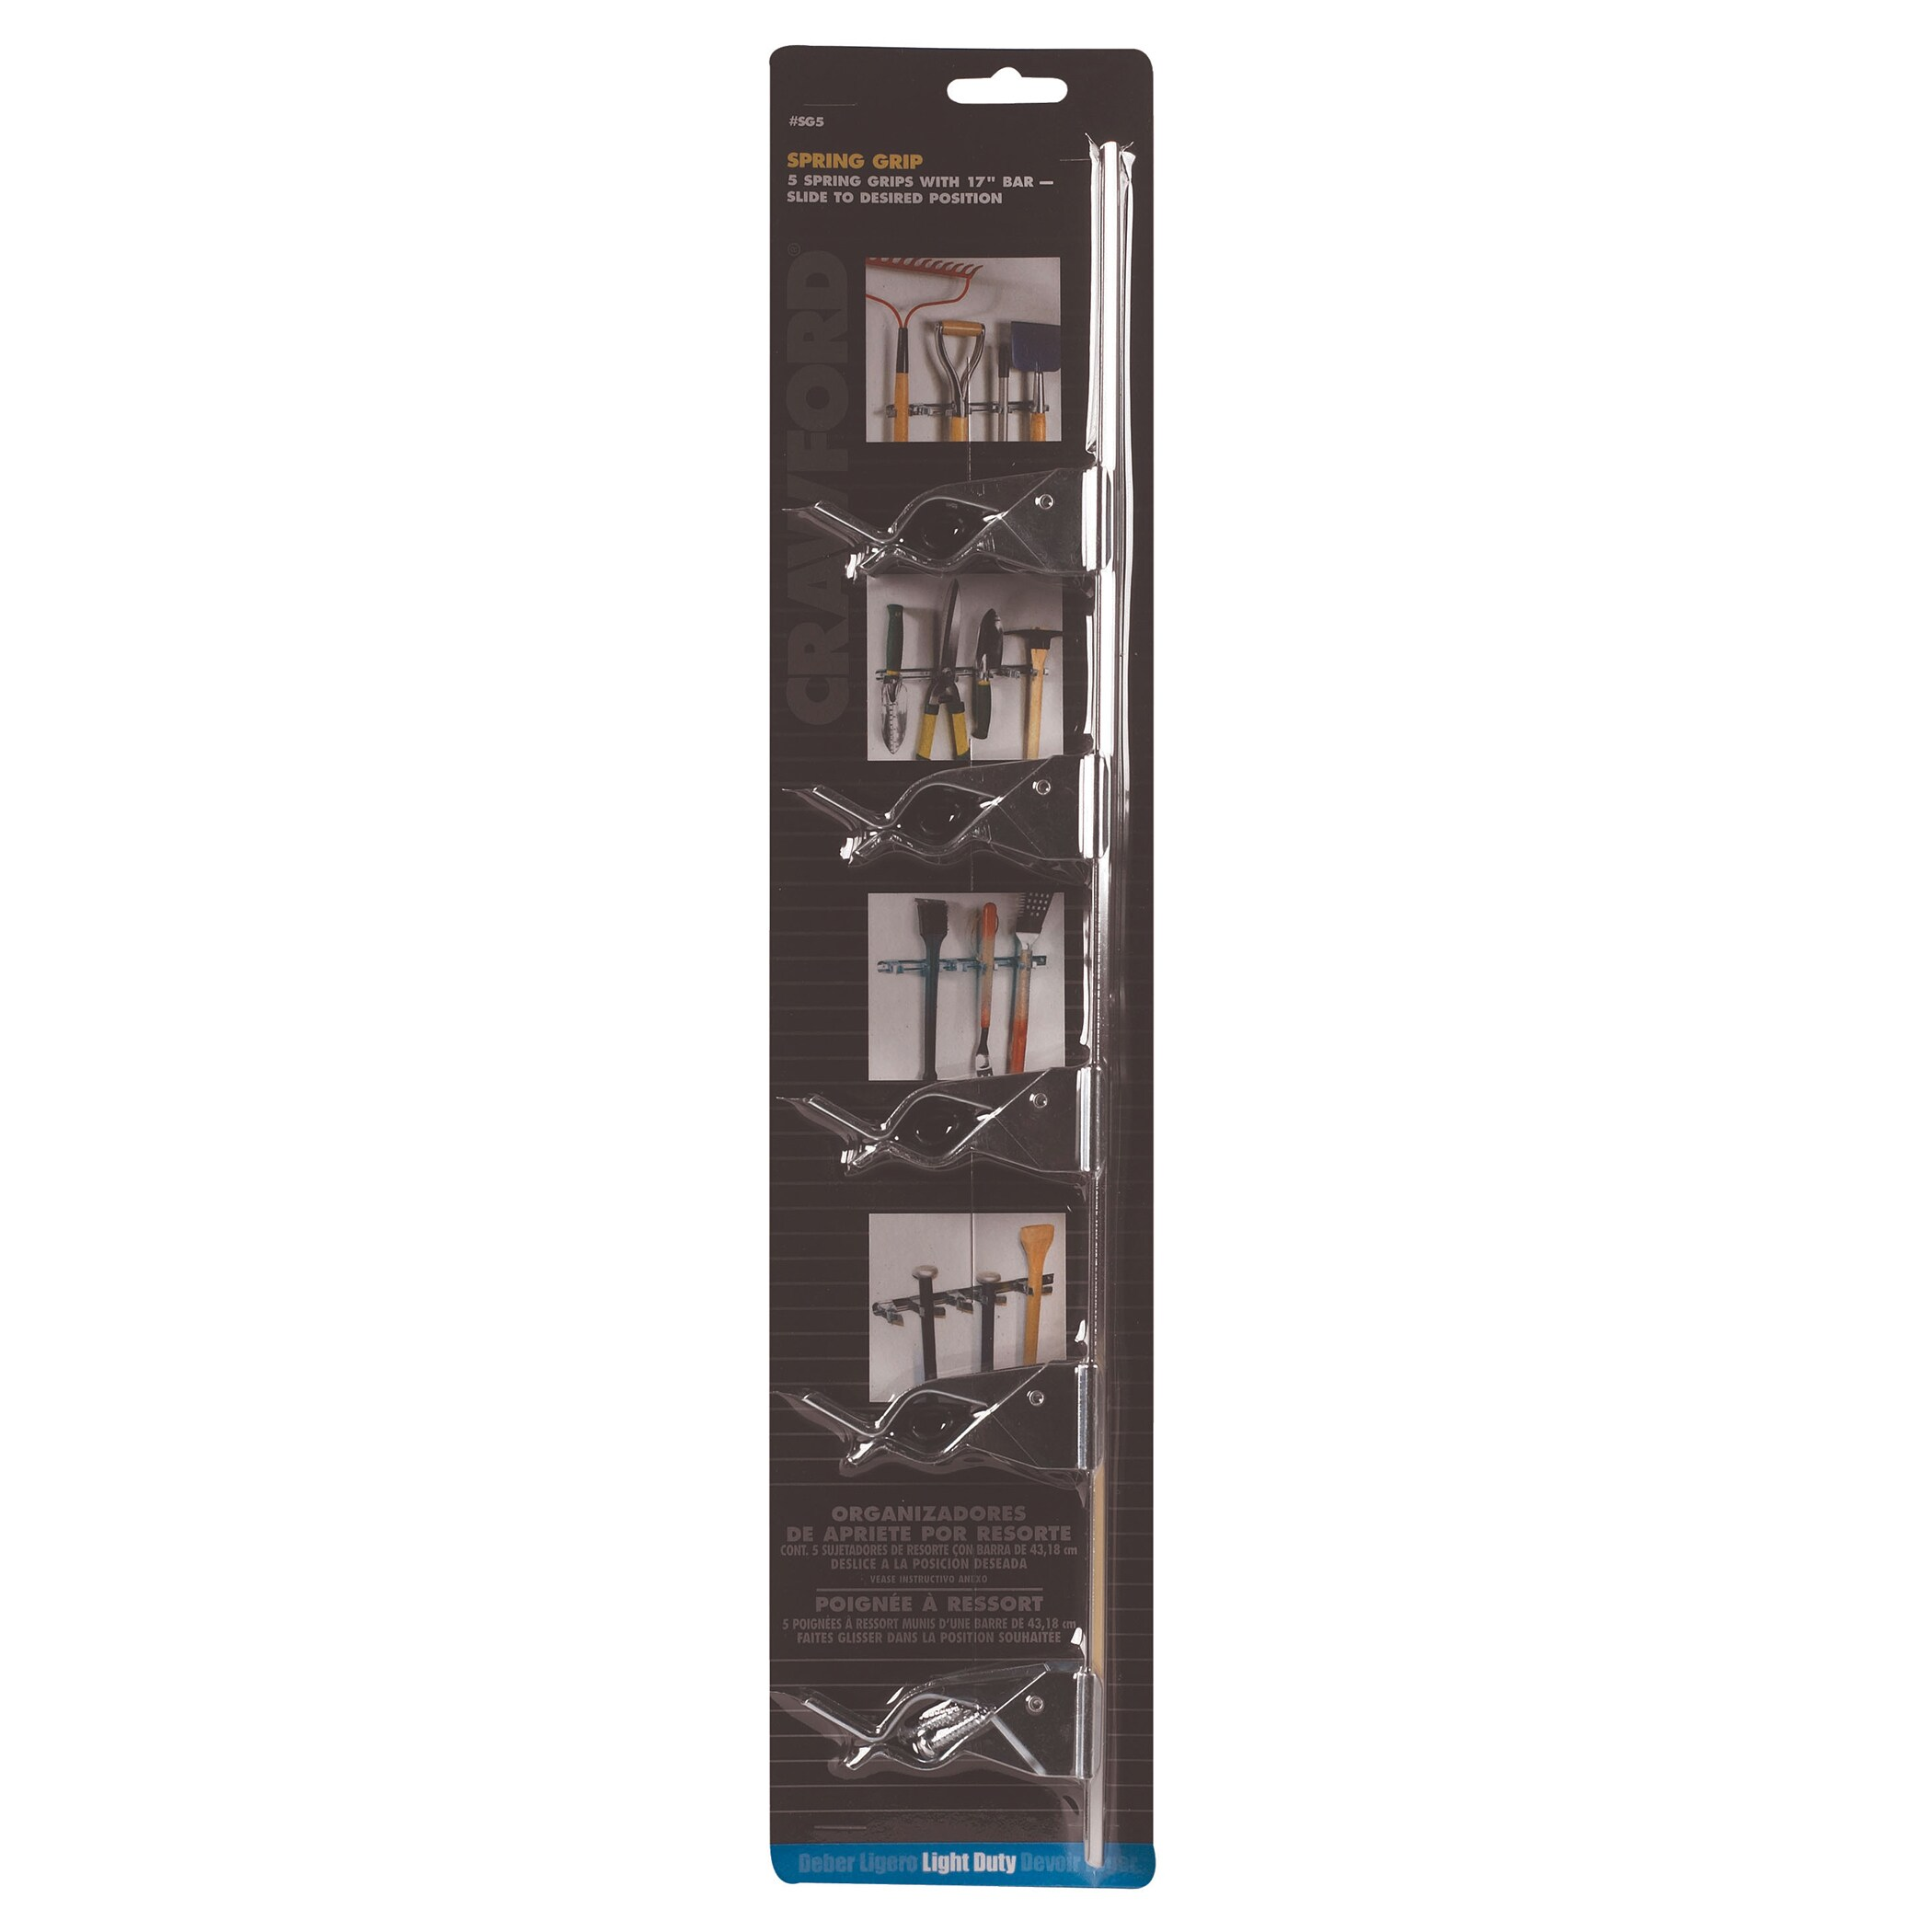 Lehigh Group SG5 Spring Grip Organizer (Hardware) (Plastic)